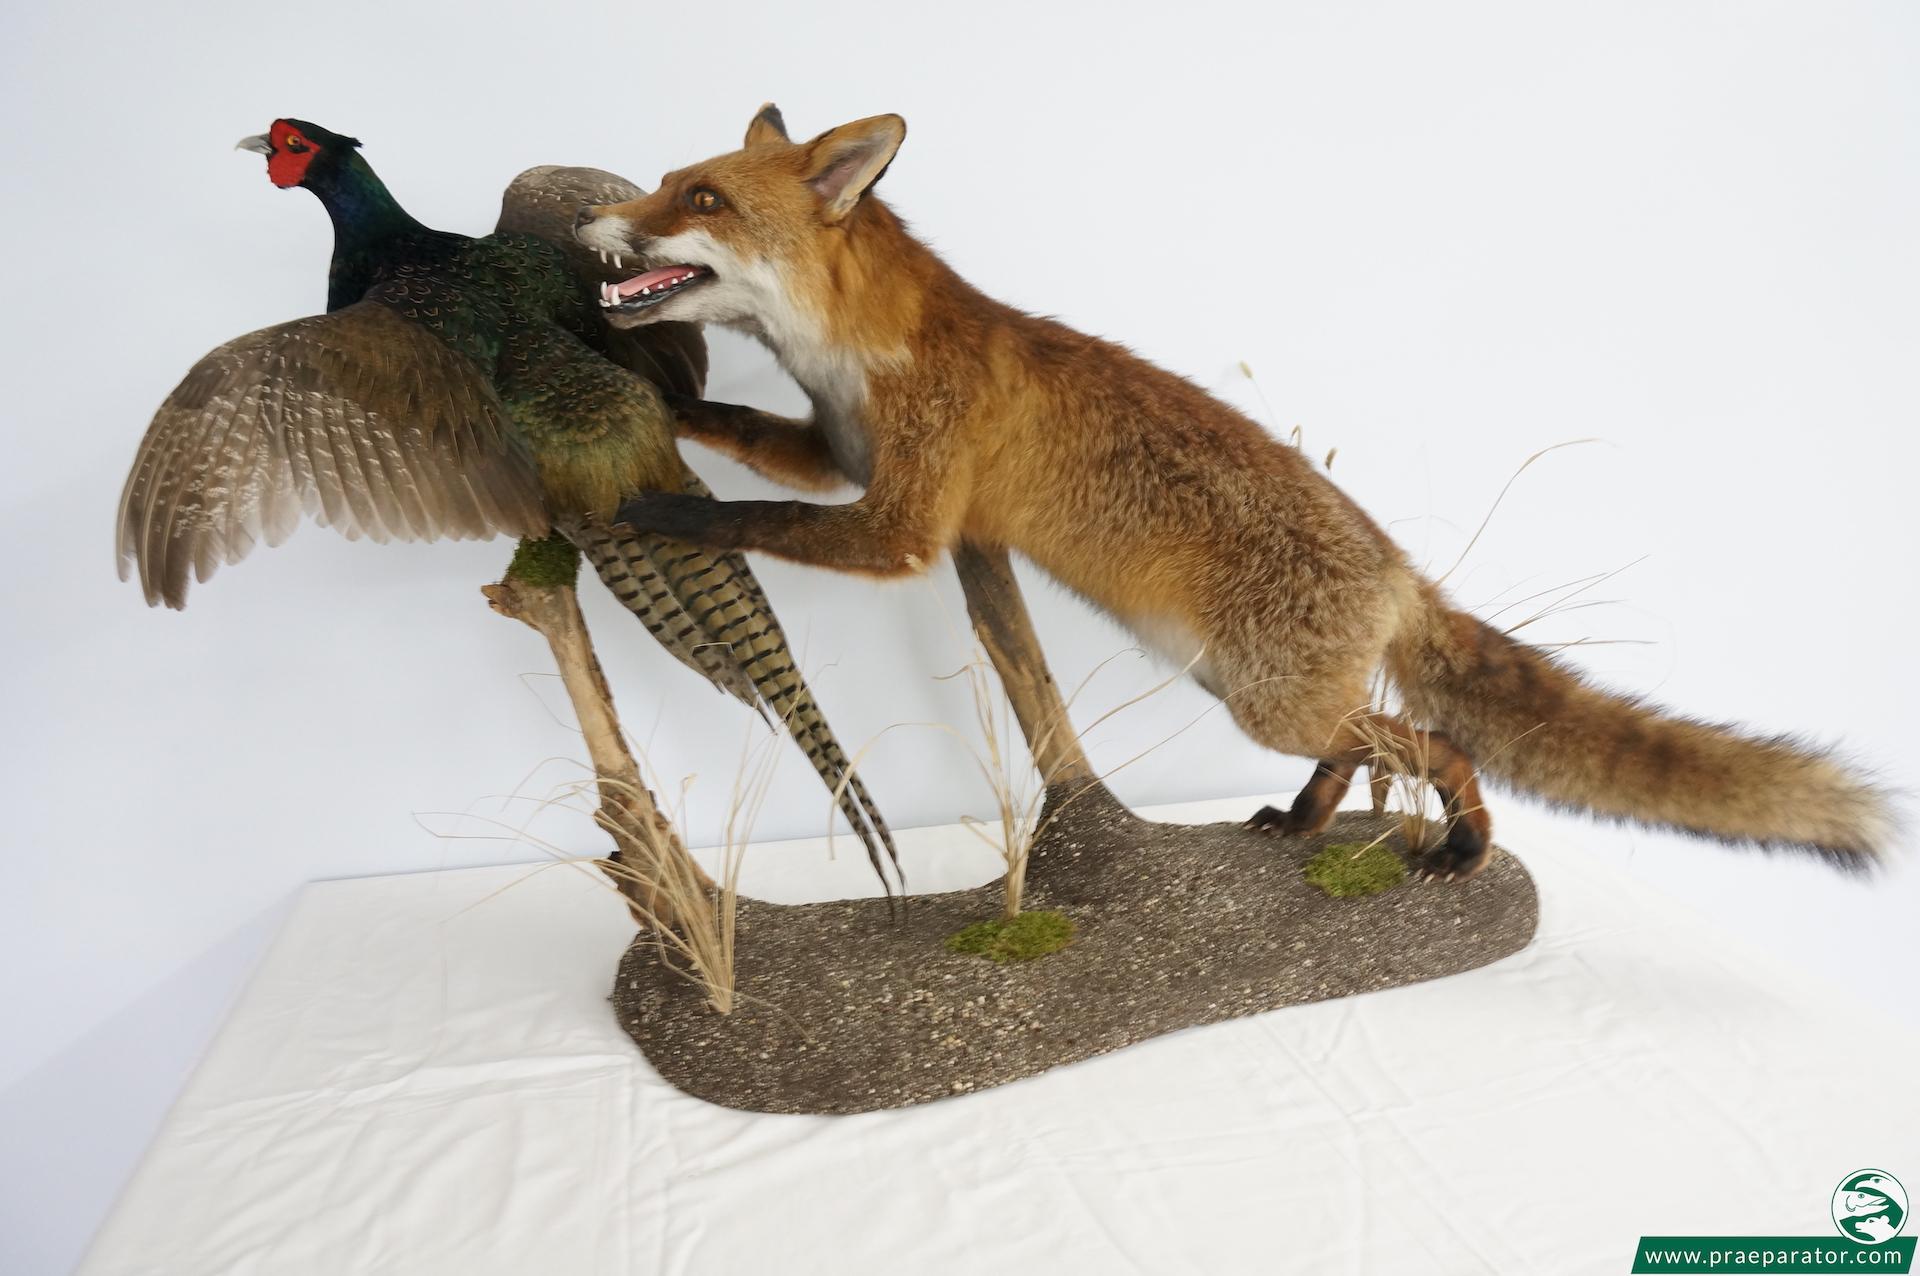 Jagd- und sonstige Tierpräparation